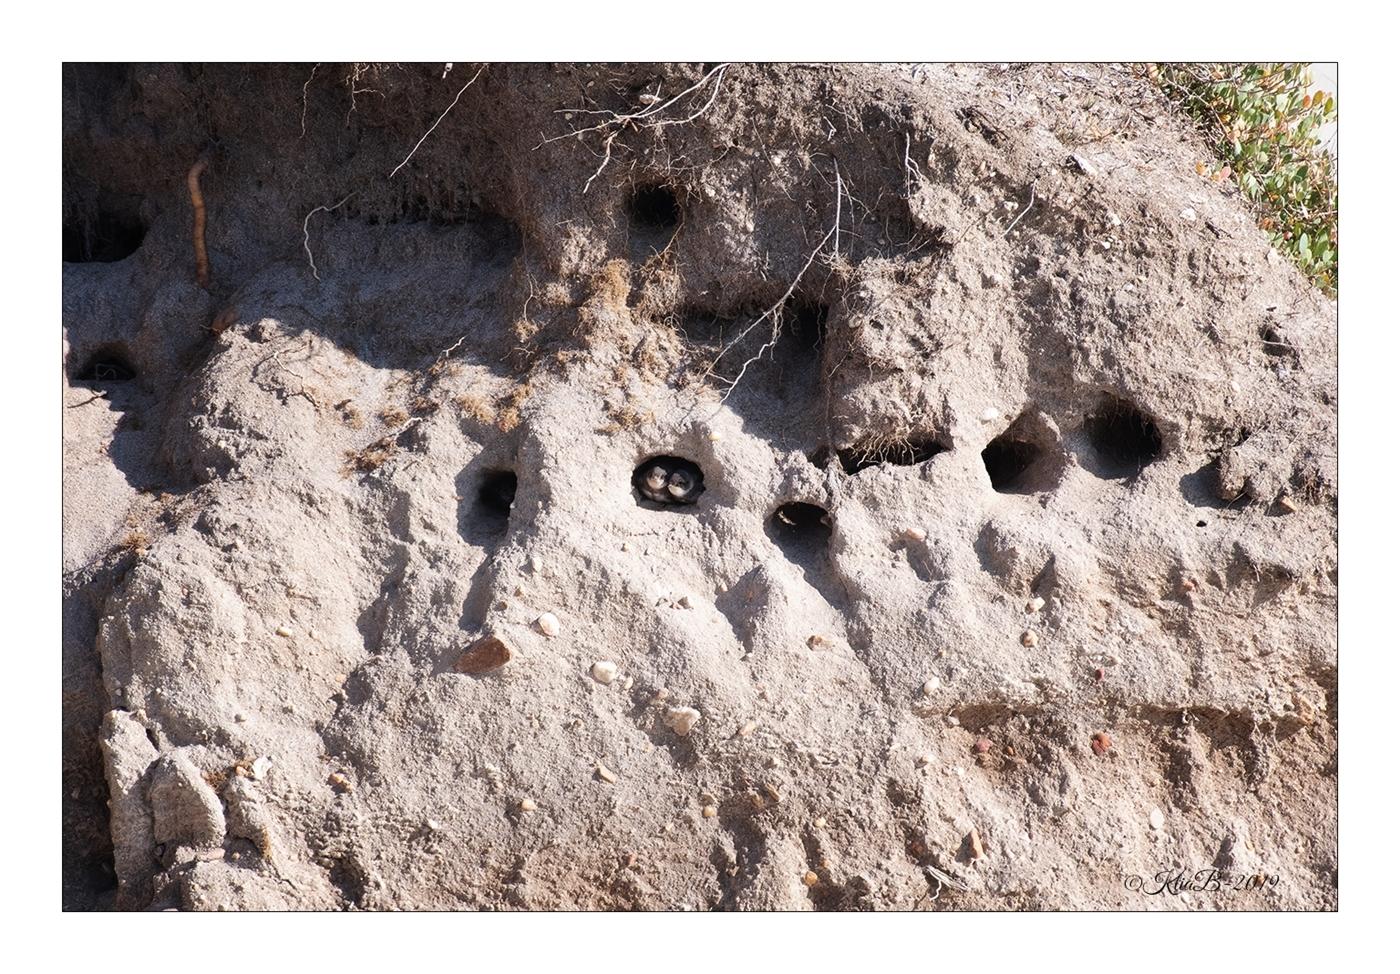 Jeunes Hirondelles de Rivage (Riparia riparia)